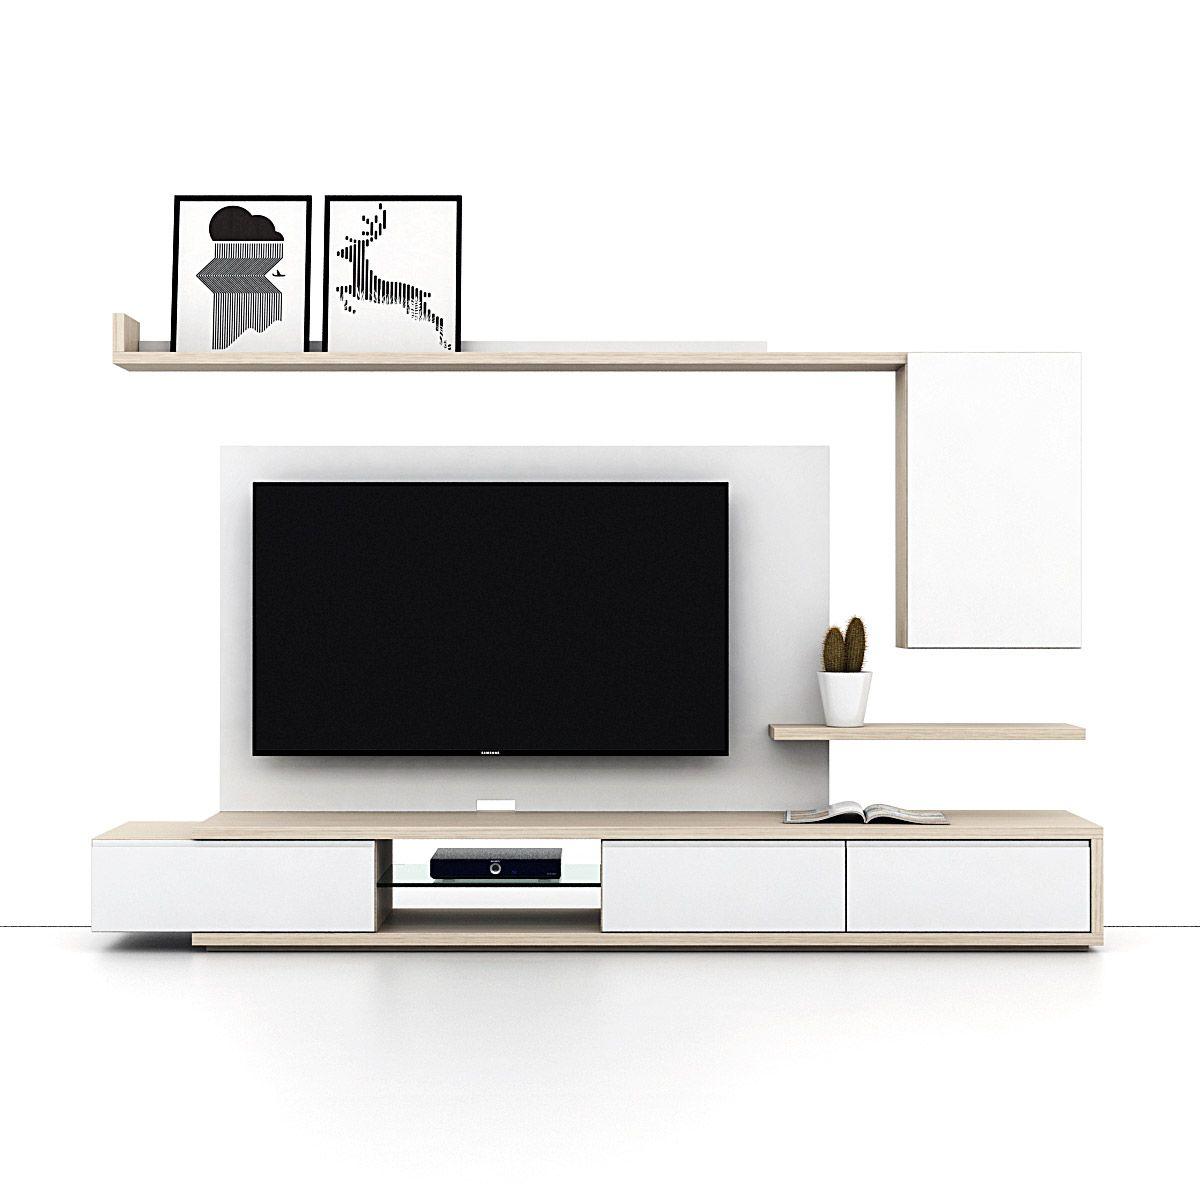 Mueble tv l pez 55 en 2019 muebles para tv for Mesa para tv 55 pulgadas